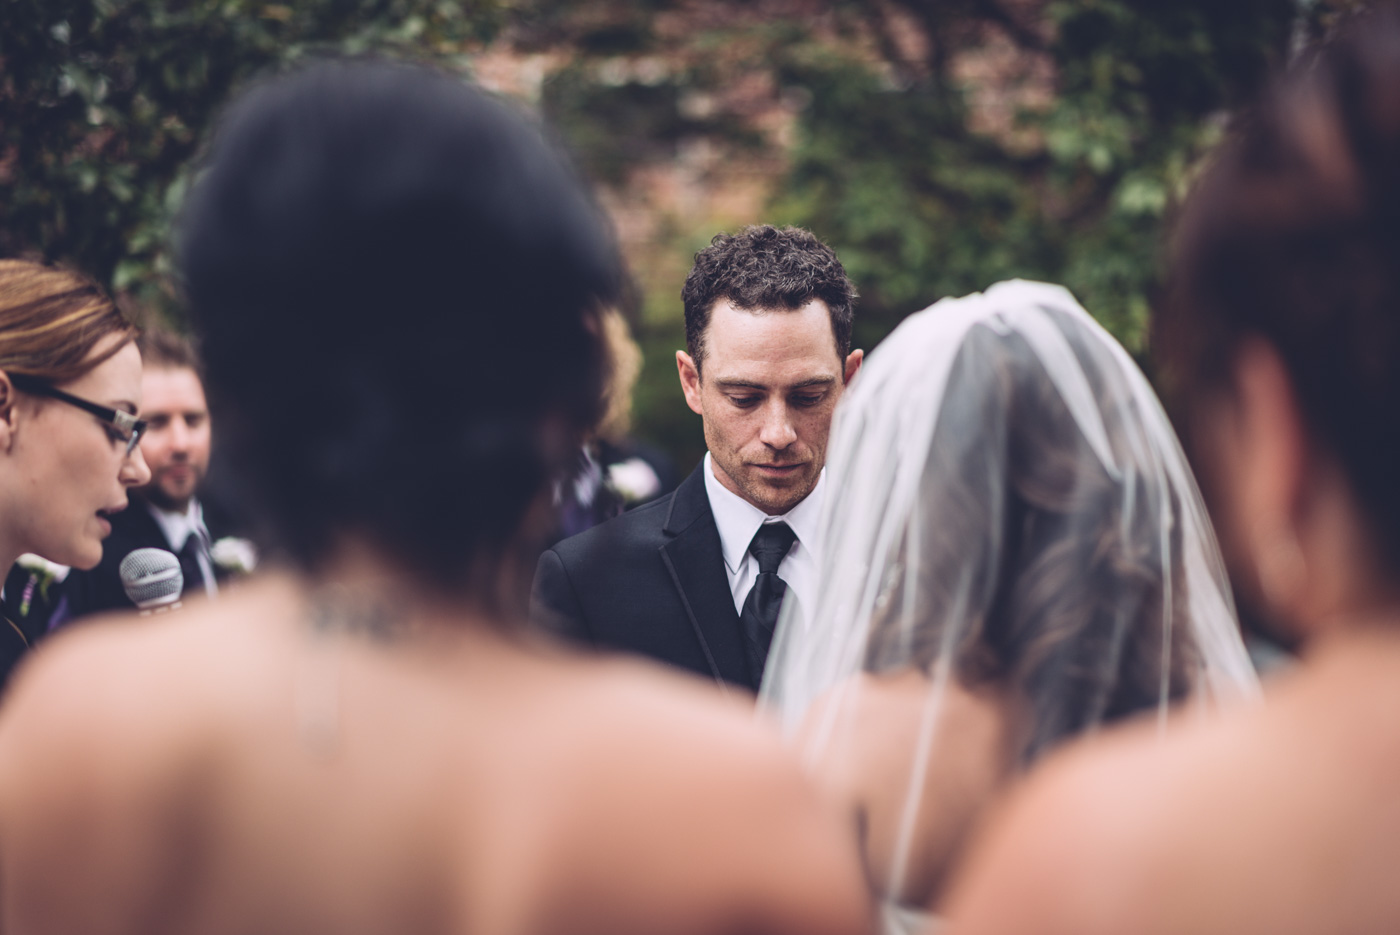 raeanne_lance_wedding_blog11.jpg